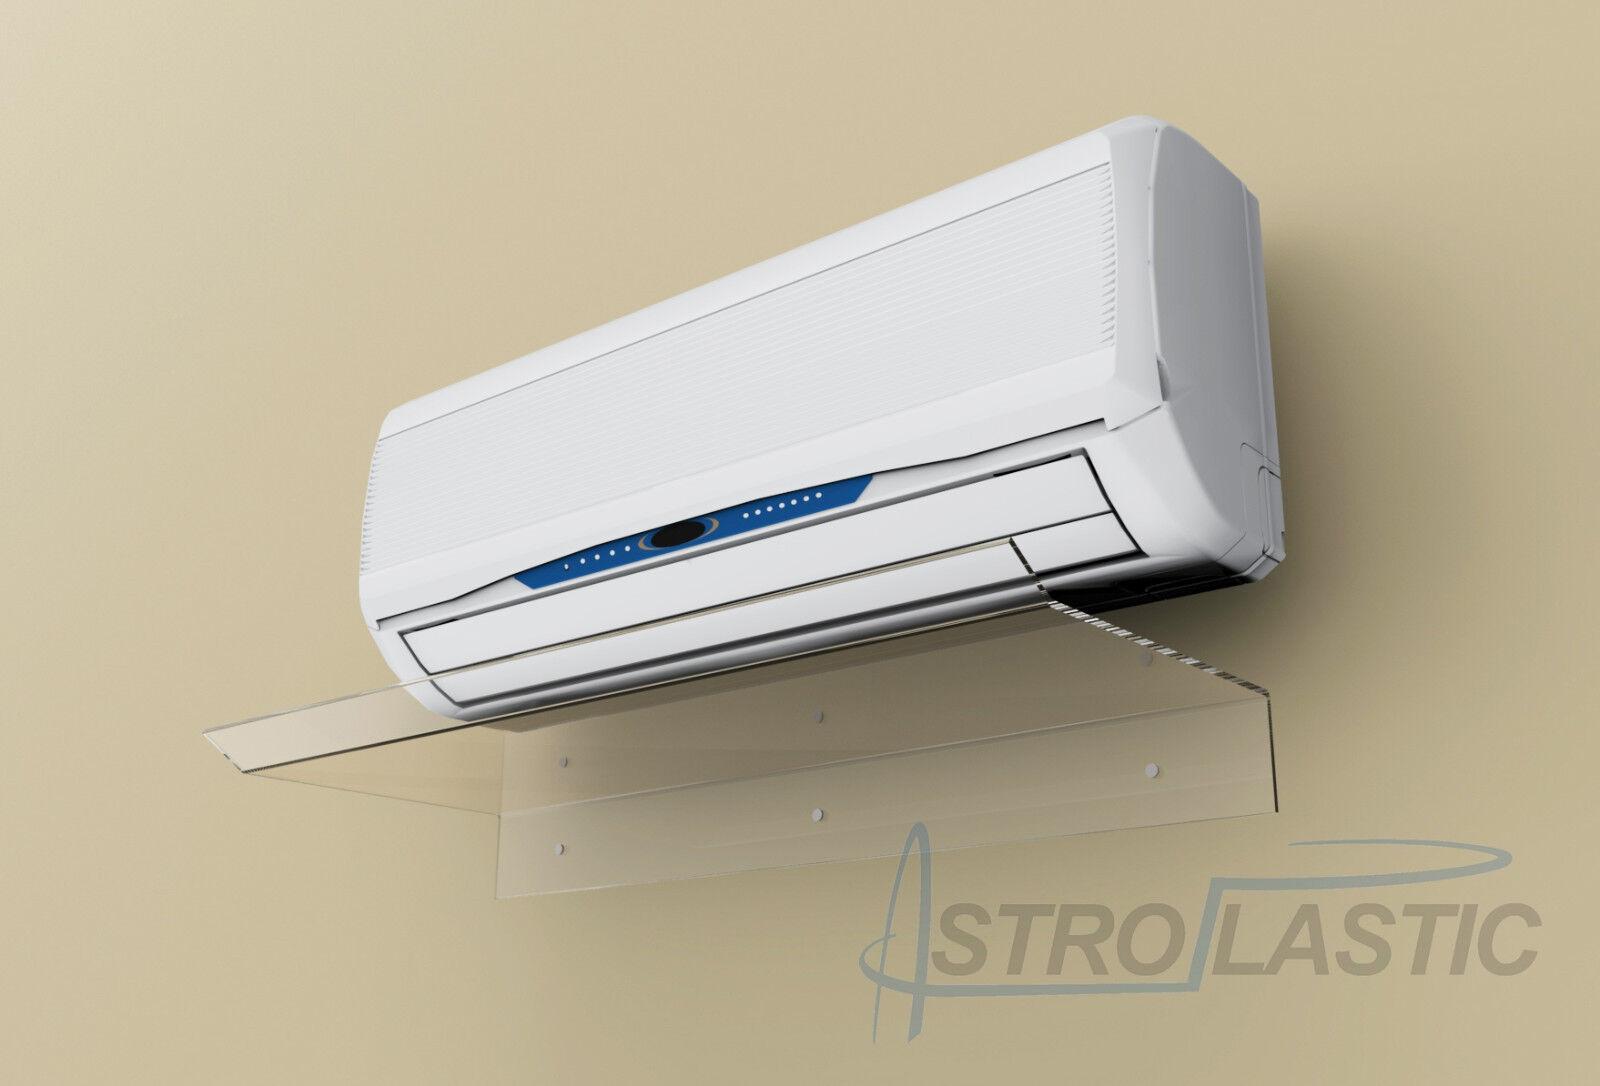 Deflettore deviatore aria per condizionatori split in plexiglass L 70/75/80 cm